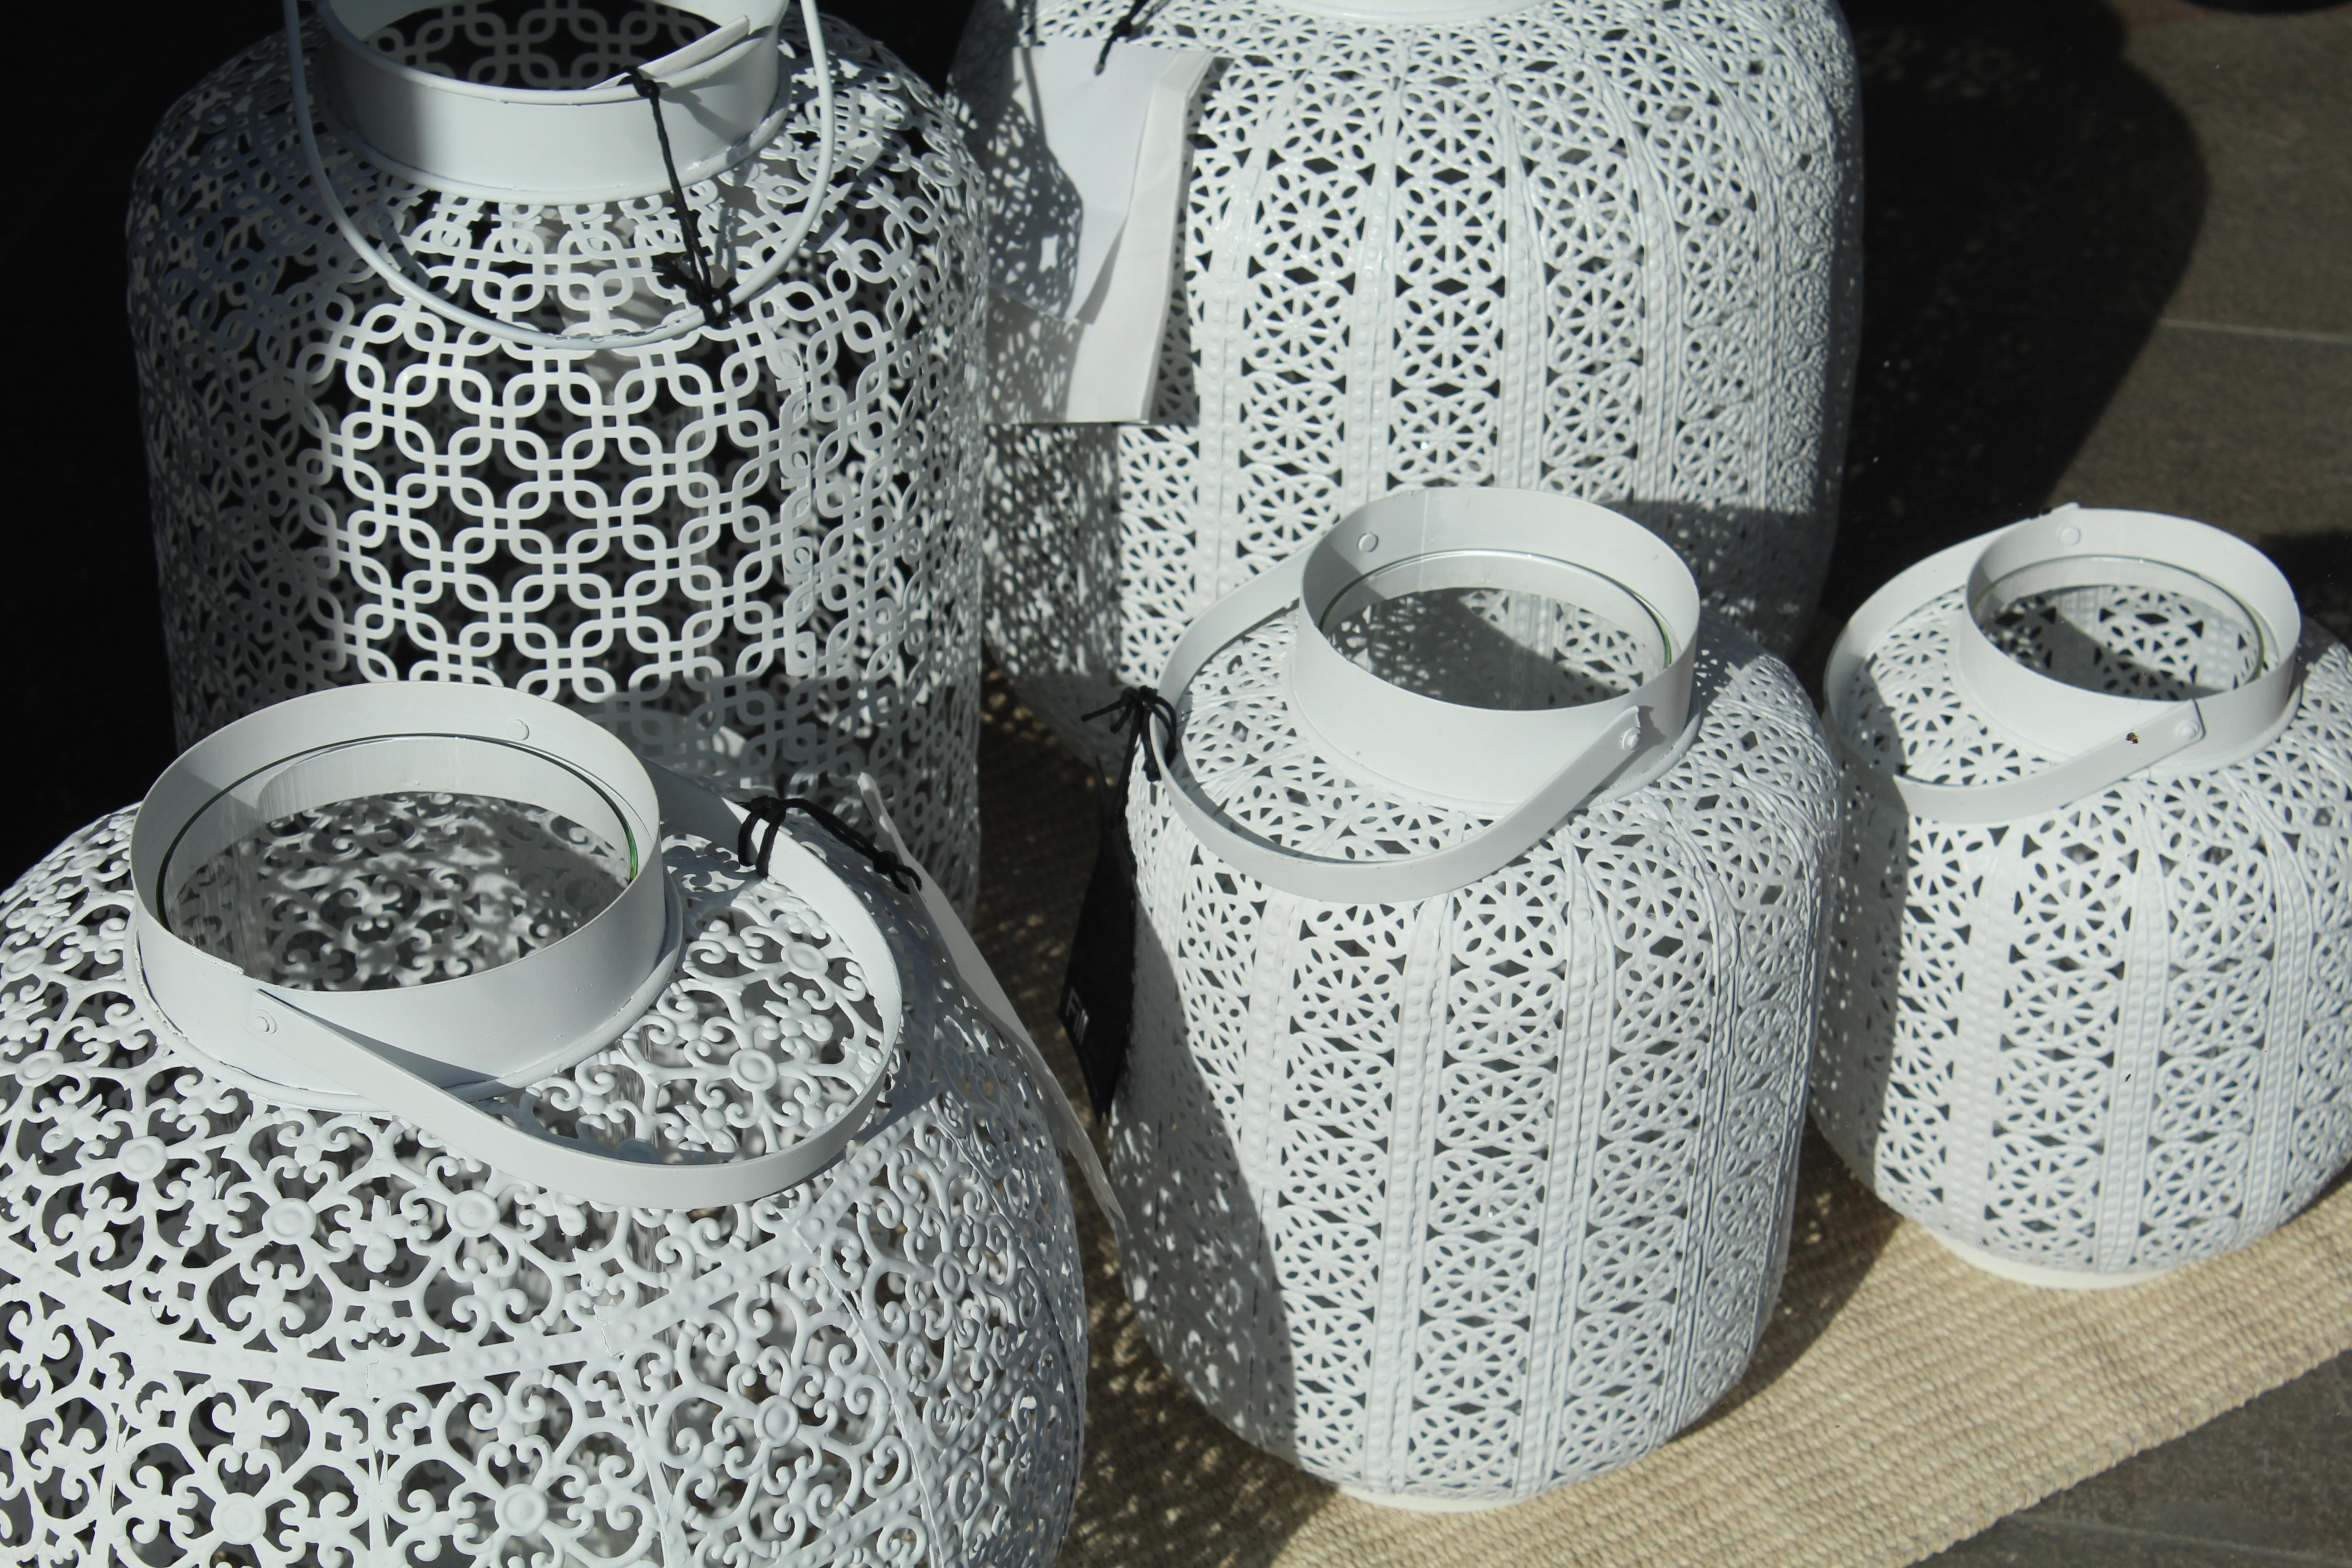 Kostenlose foto : Muster, Geschäft, Keramik, Material, häkeln ...